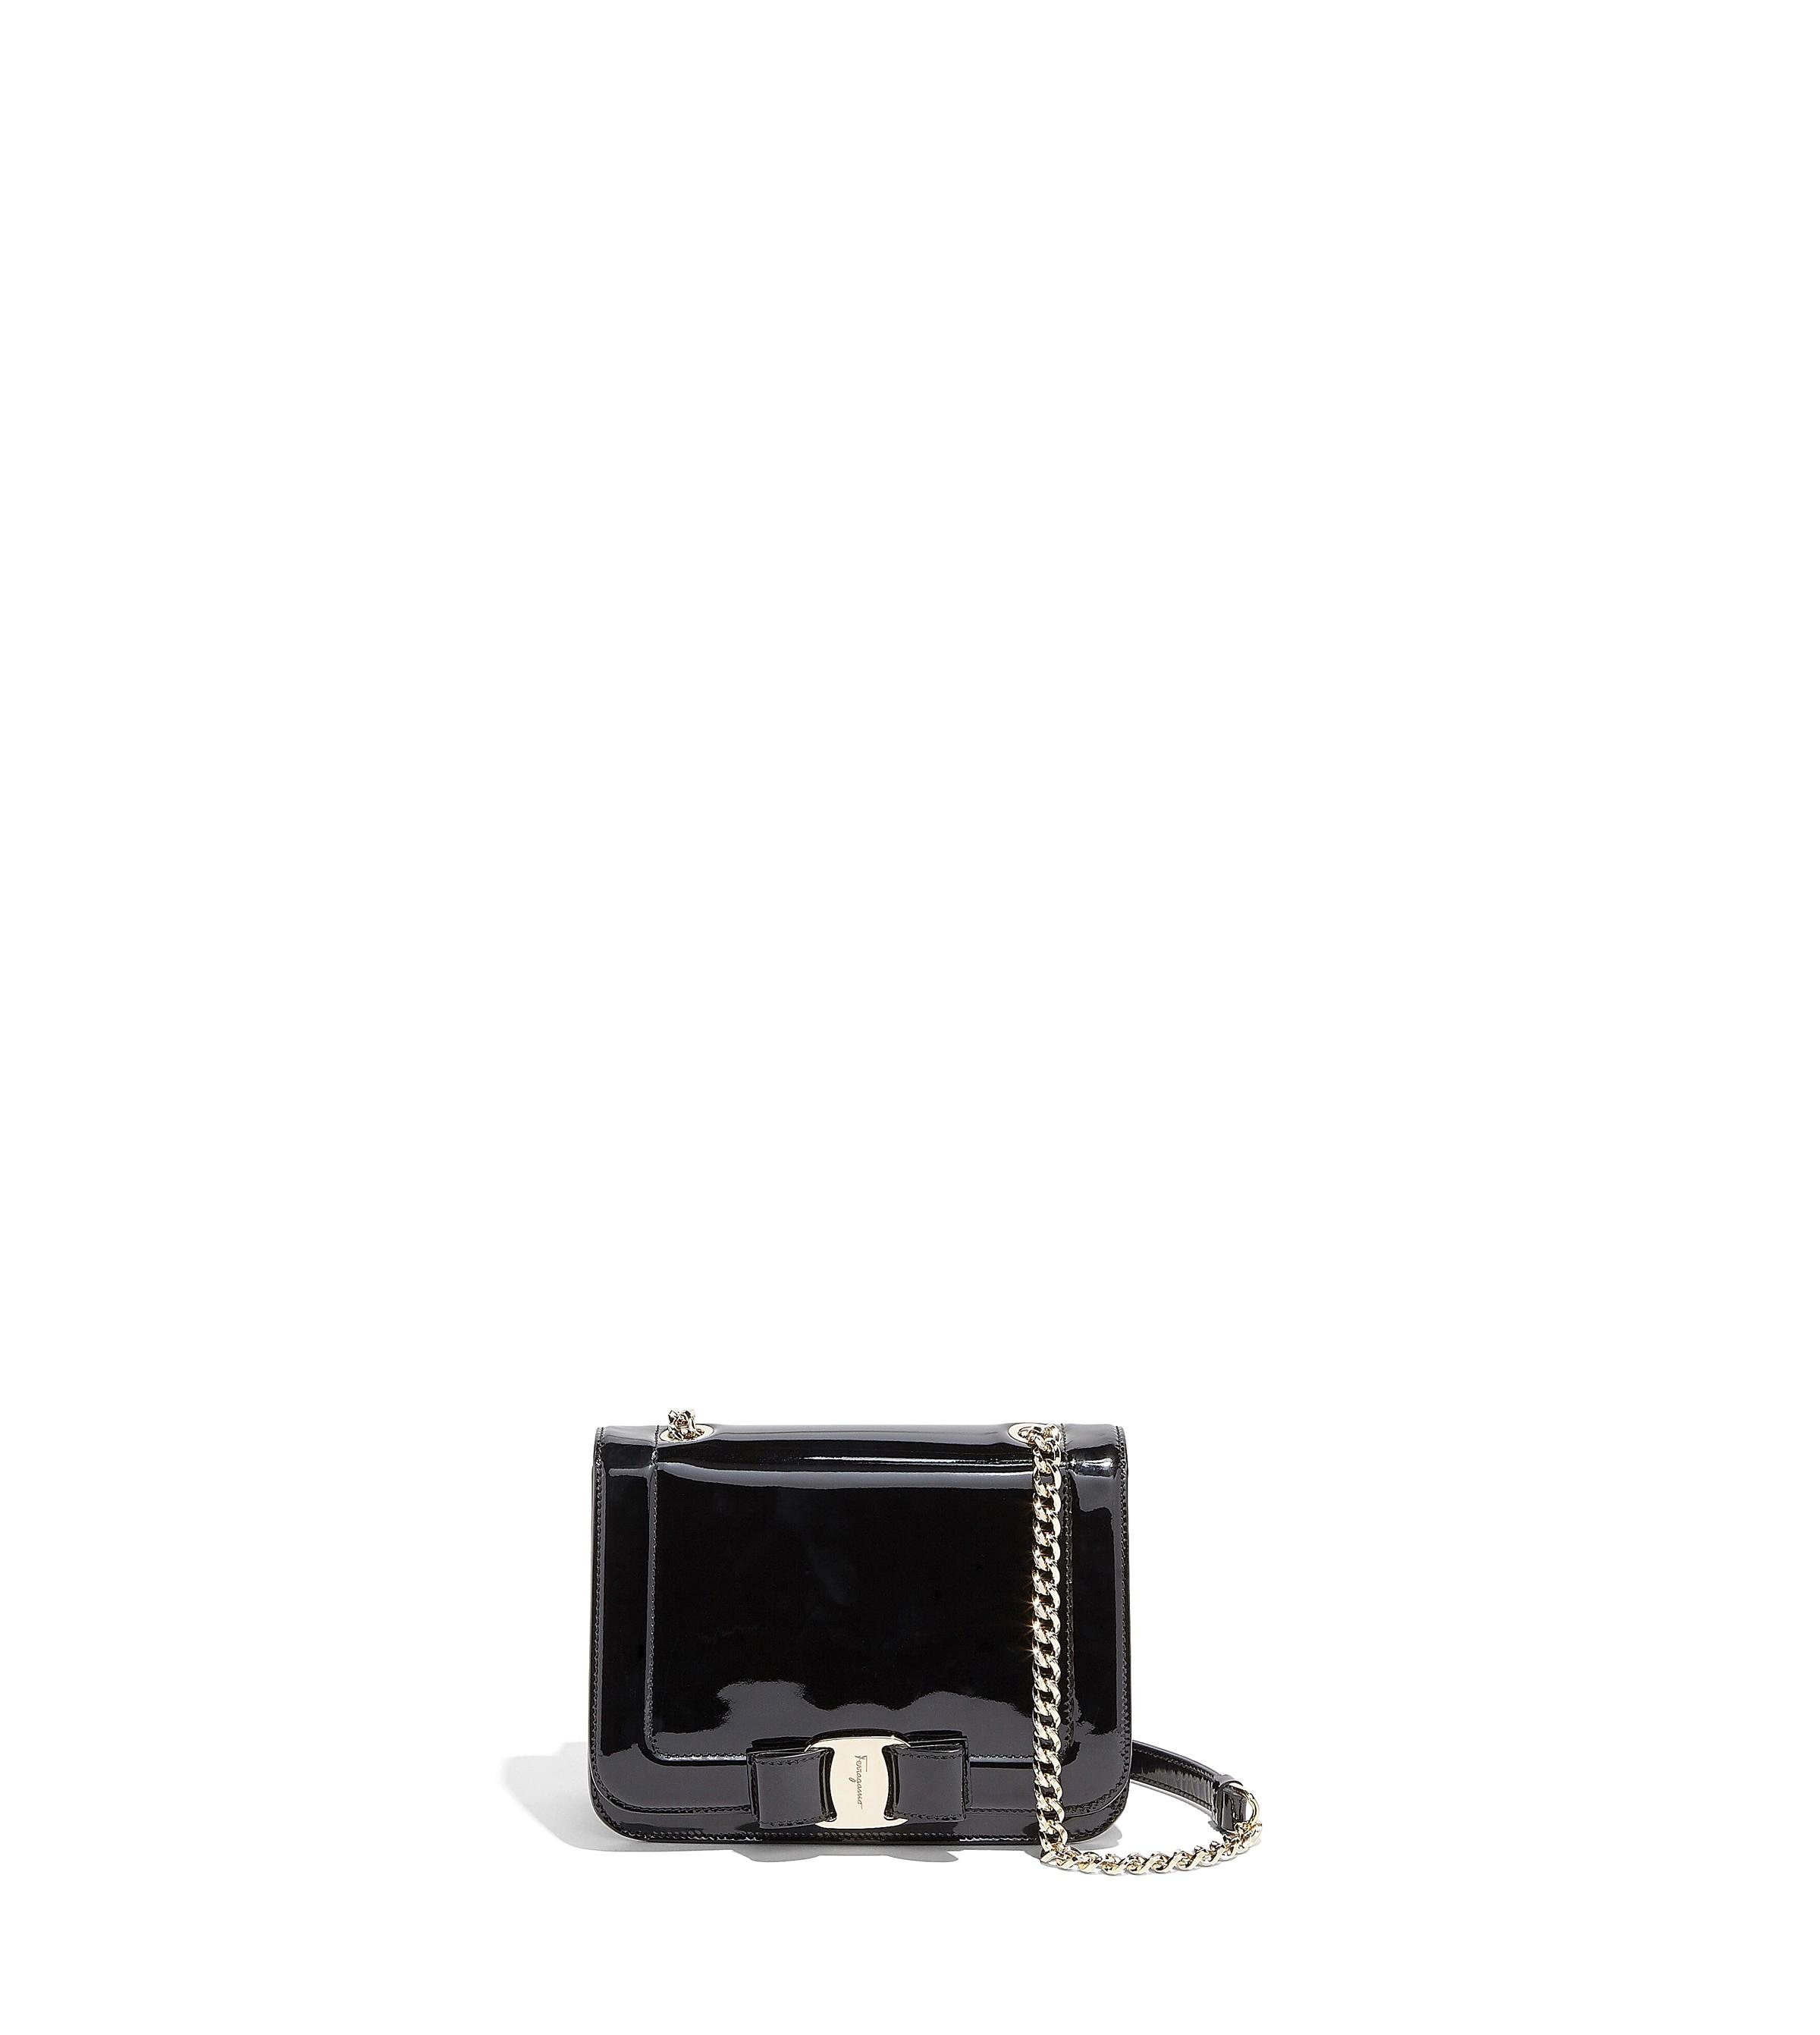 Salvatore Ferragamo Vara Bow Leather Flap Shoulder Bag In Black